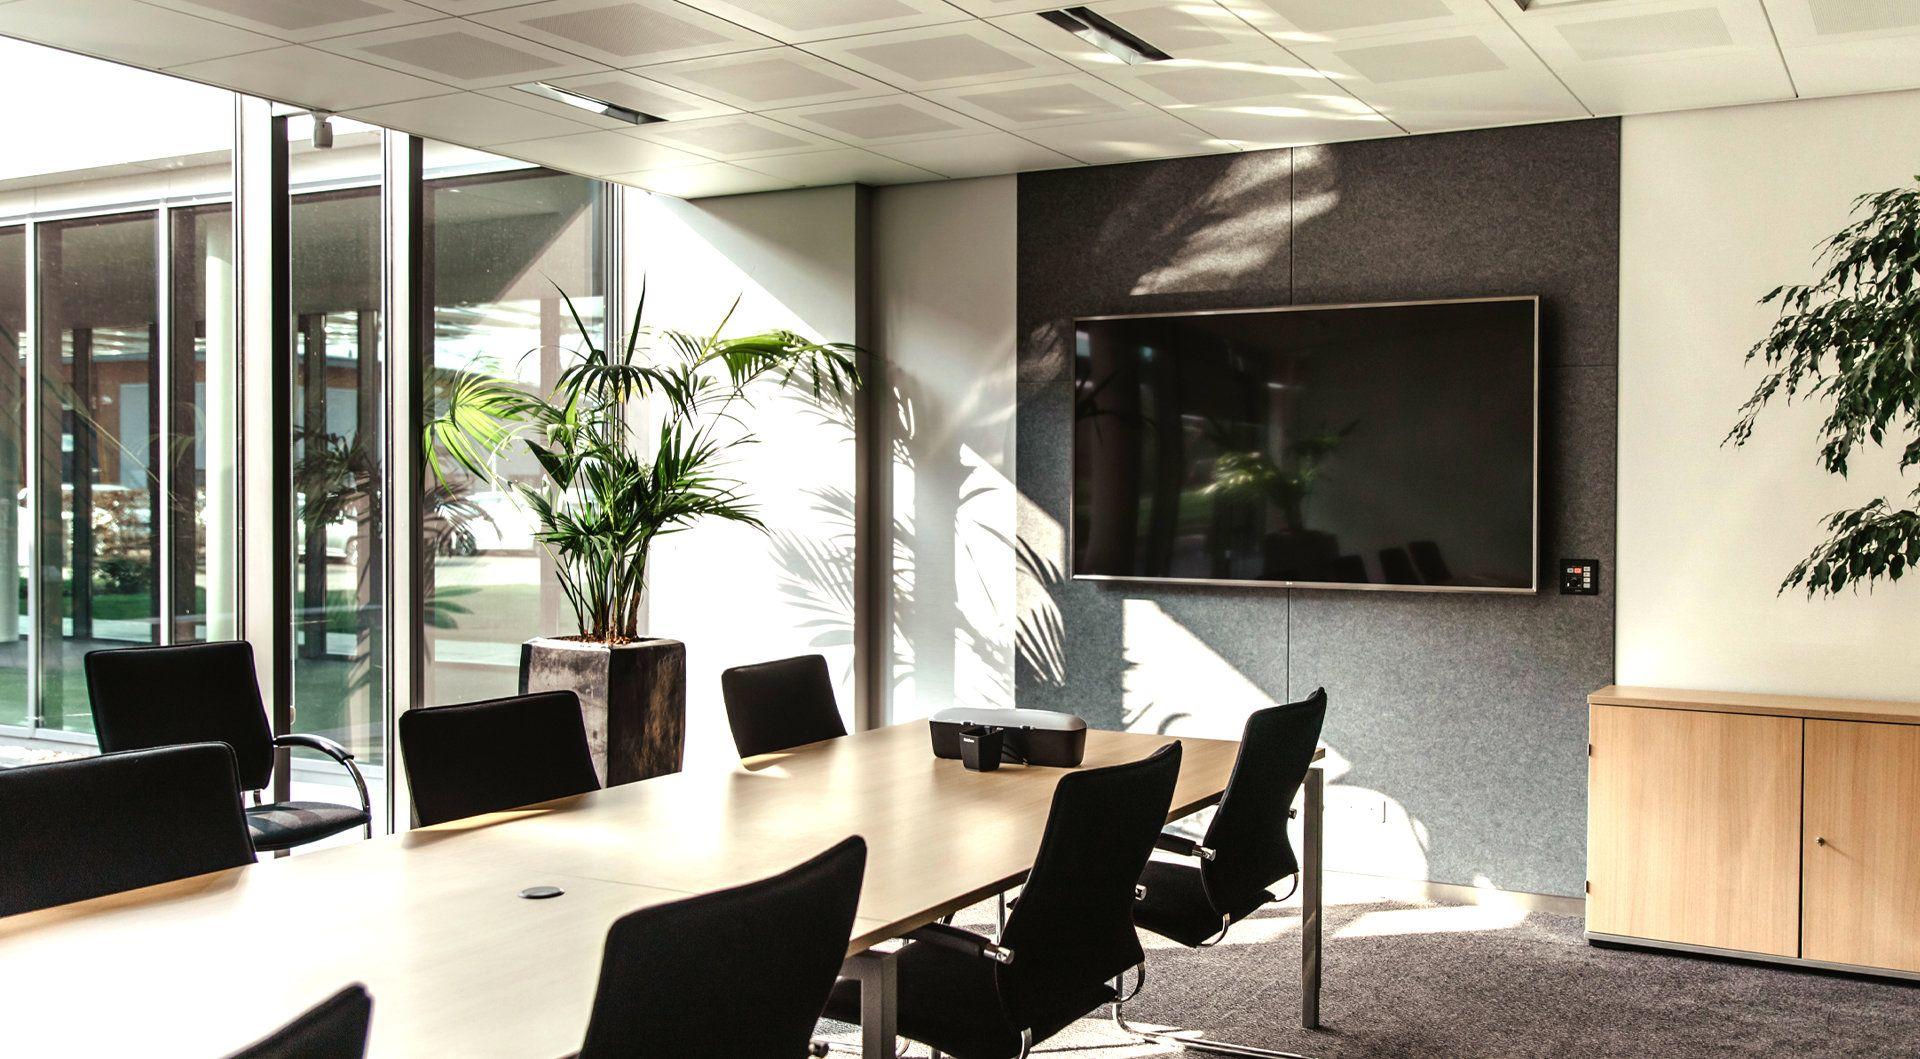 Sony VPL-FHZ120L beamer/projector Plafondgemonteerde projector 12000 ANSI lumens 3LCD WUXGA (1920x1200) Zwart - Case studie de vries